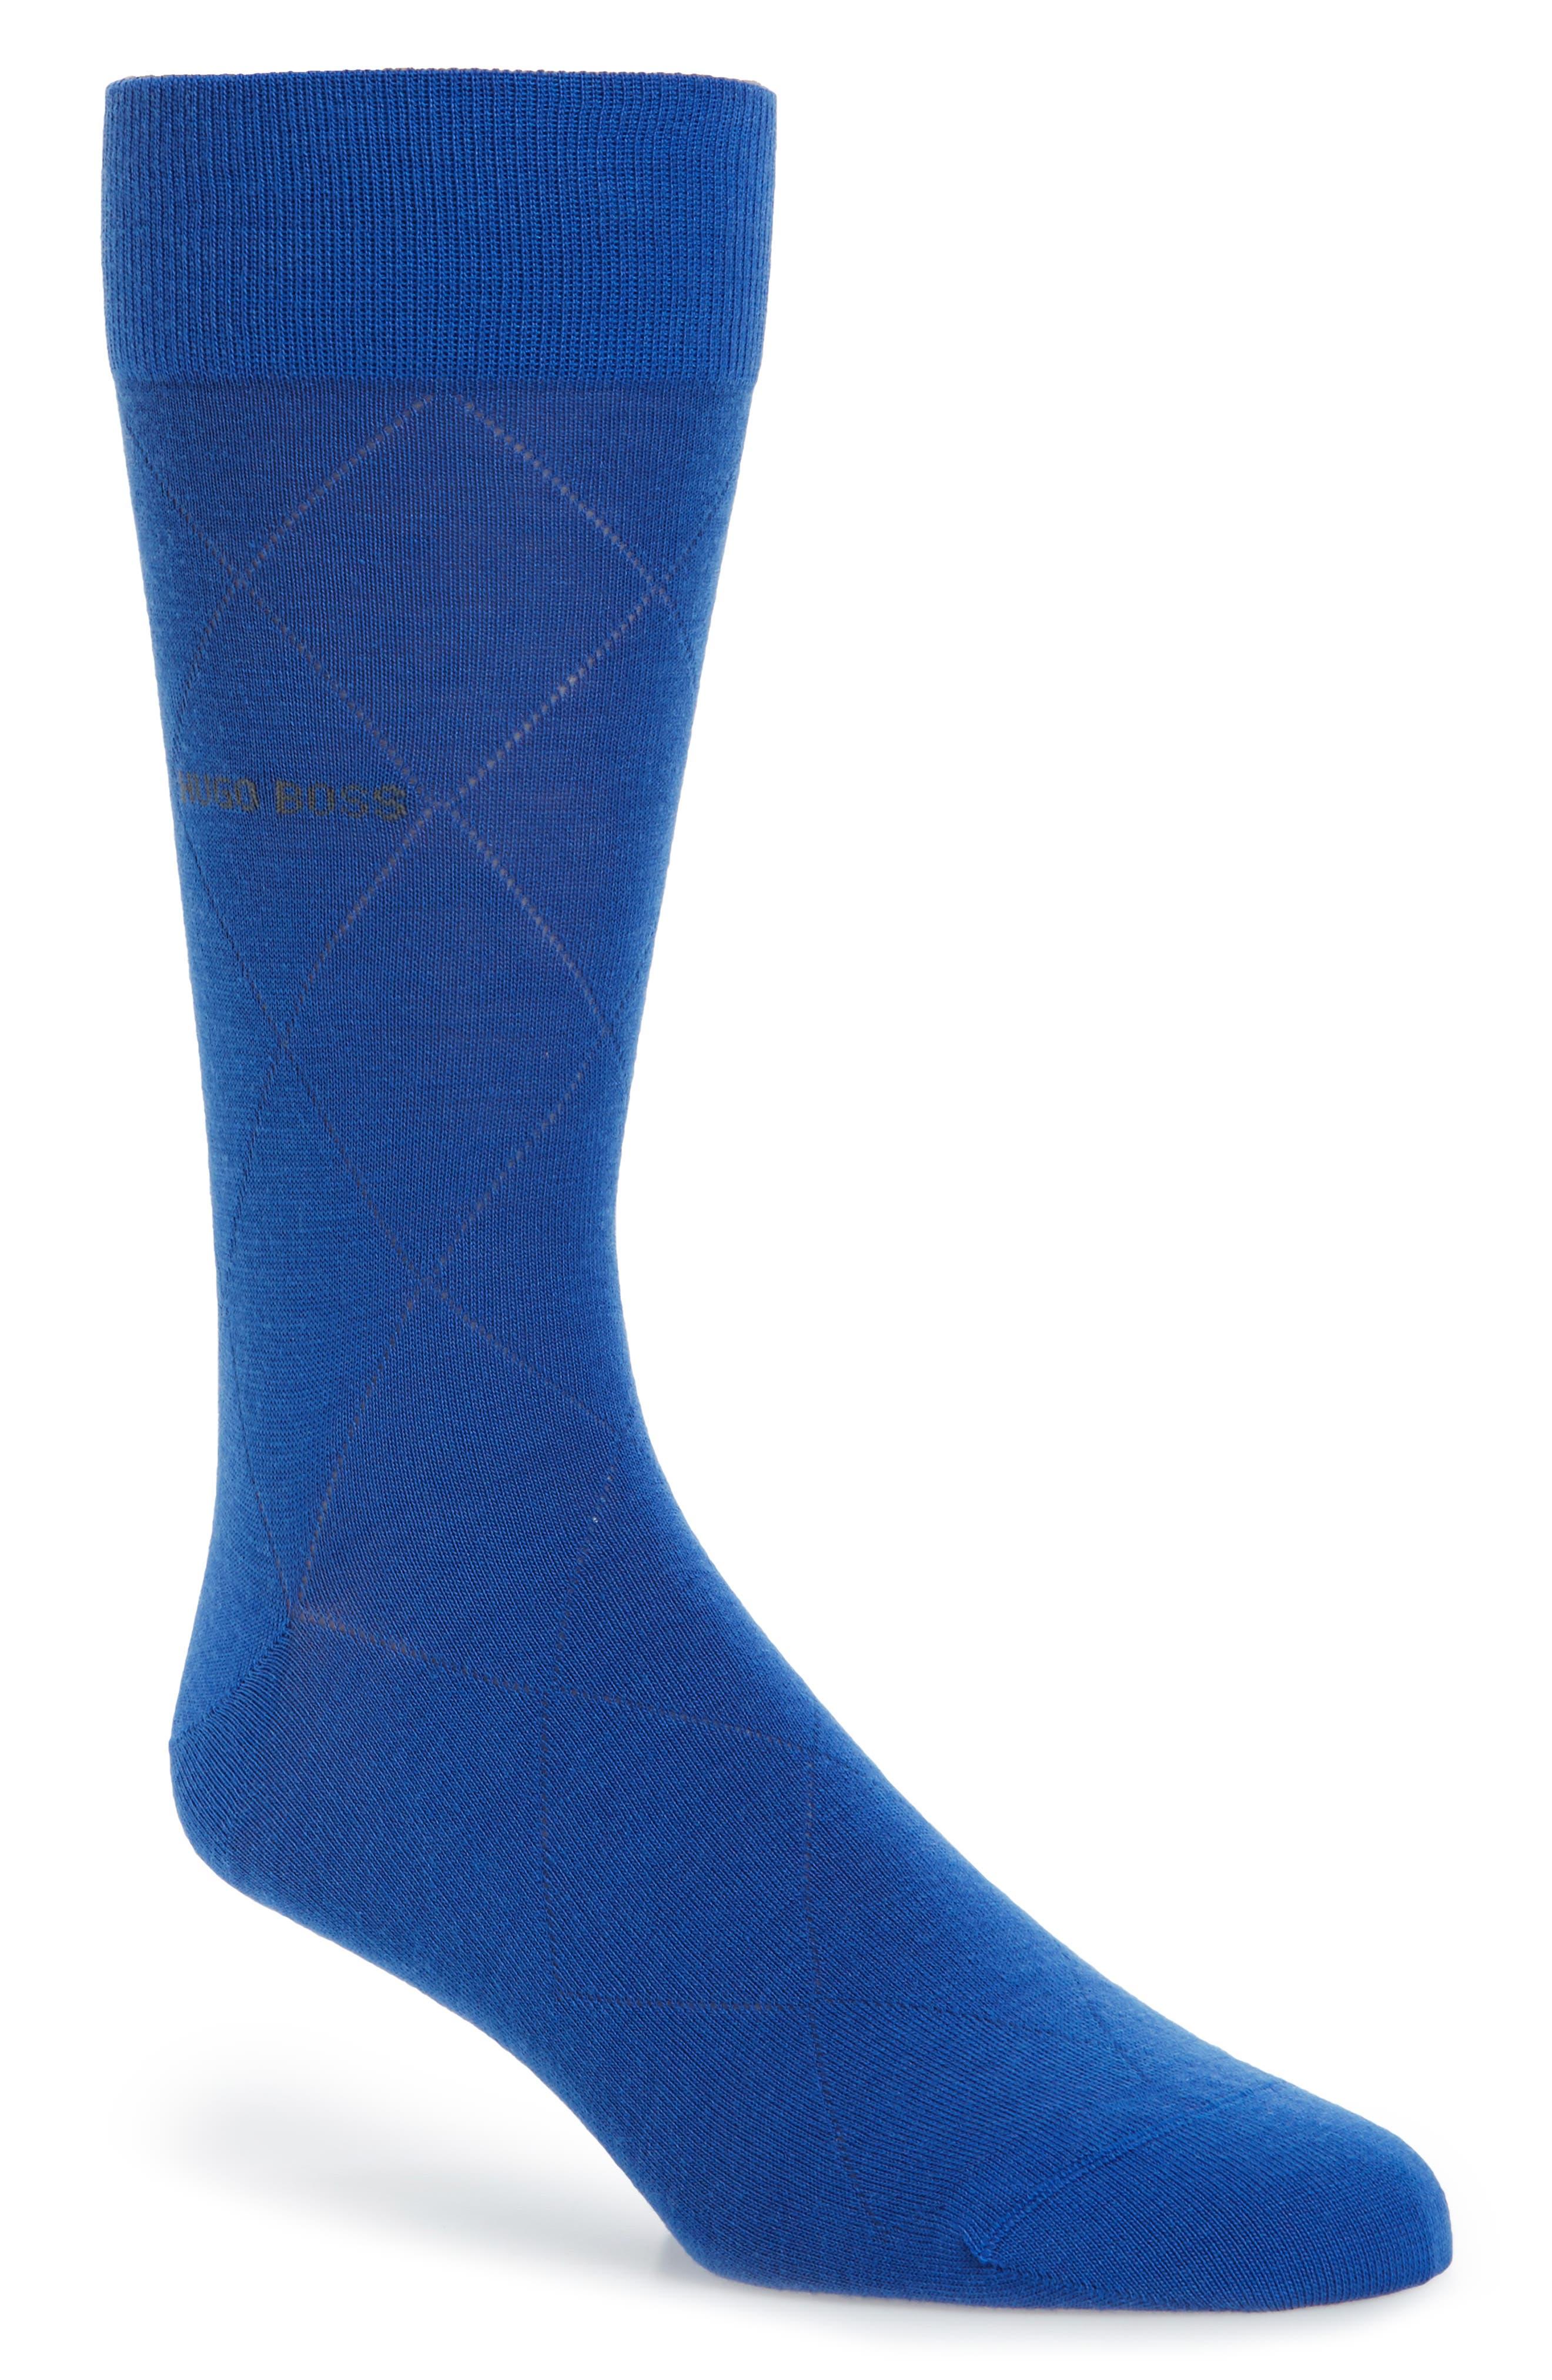 Argyle Crew Socks,                             Main thumbnail 1, color,                             Bright Blue